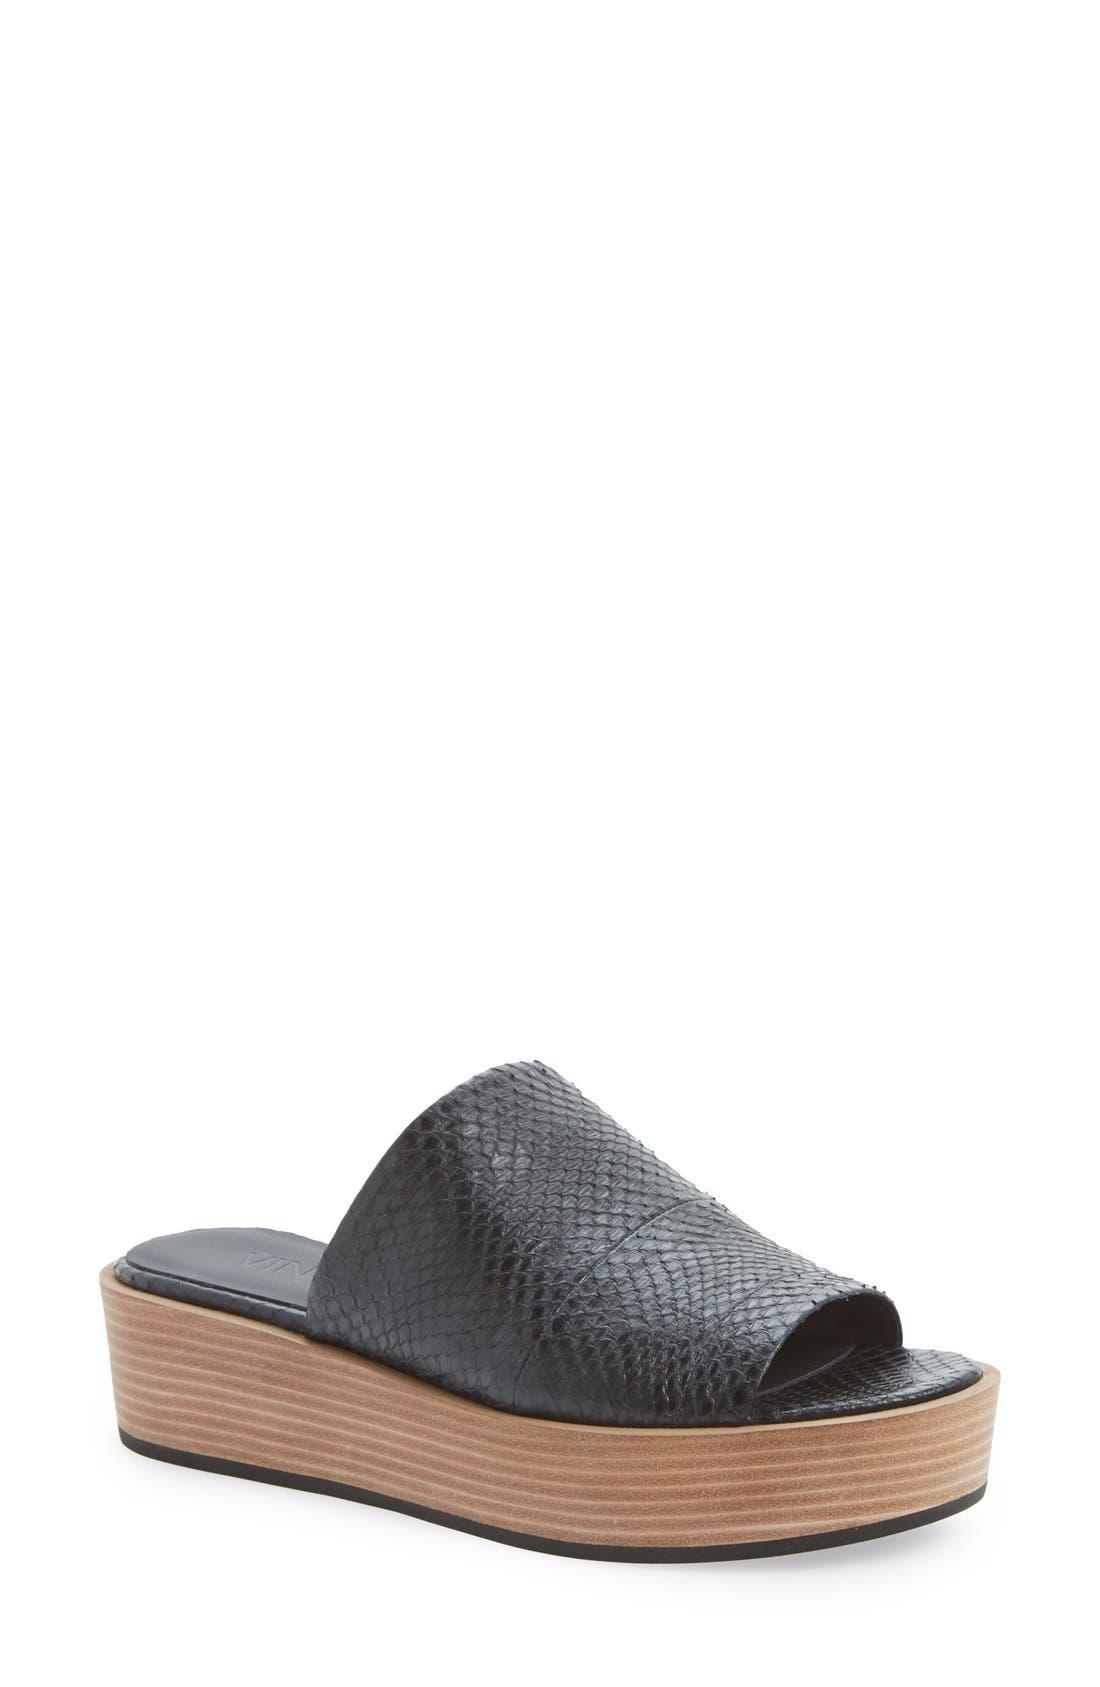 Alternate Image 1 Selected - Vince 'Saskia 2' Platform Sandal (Women)